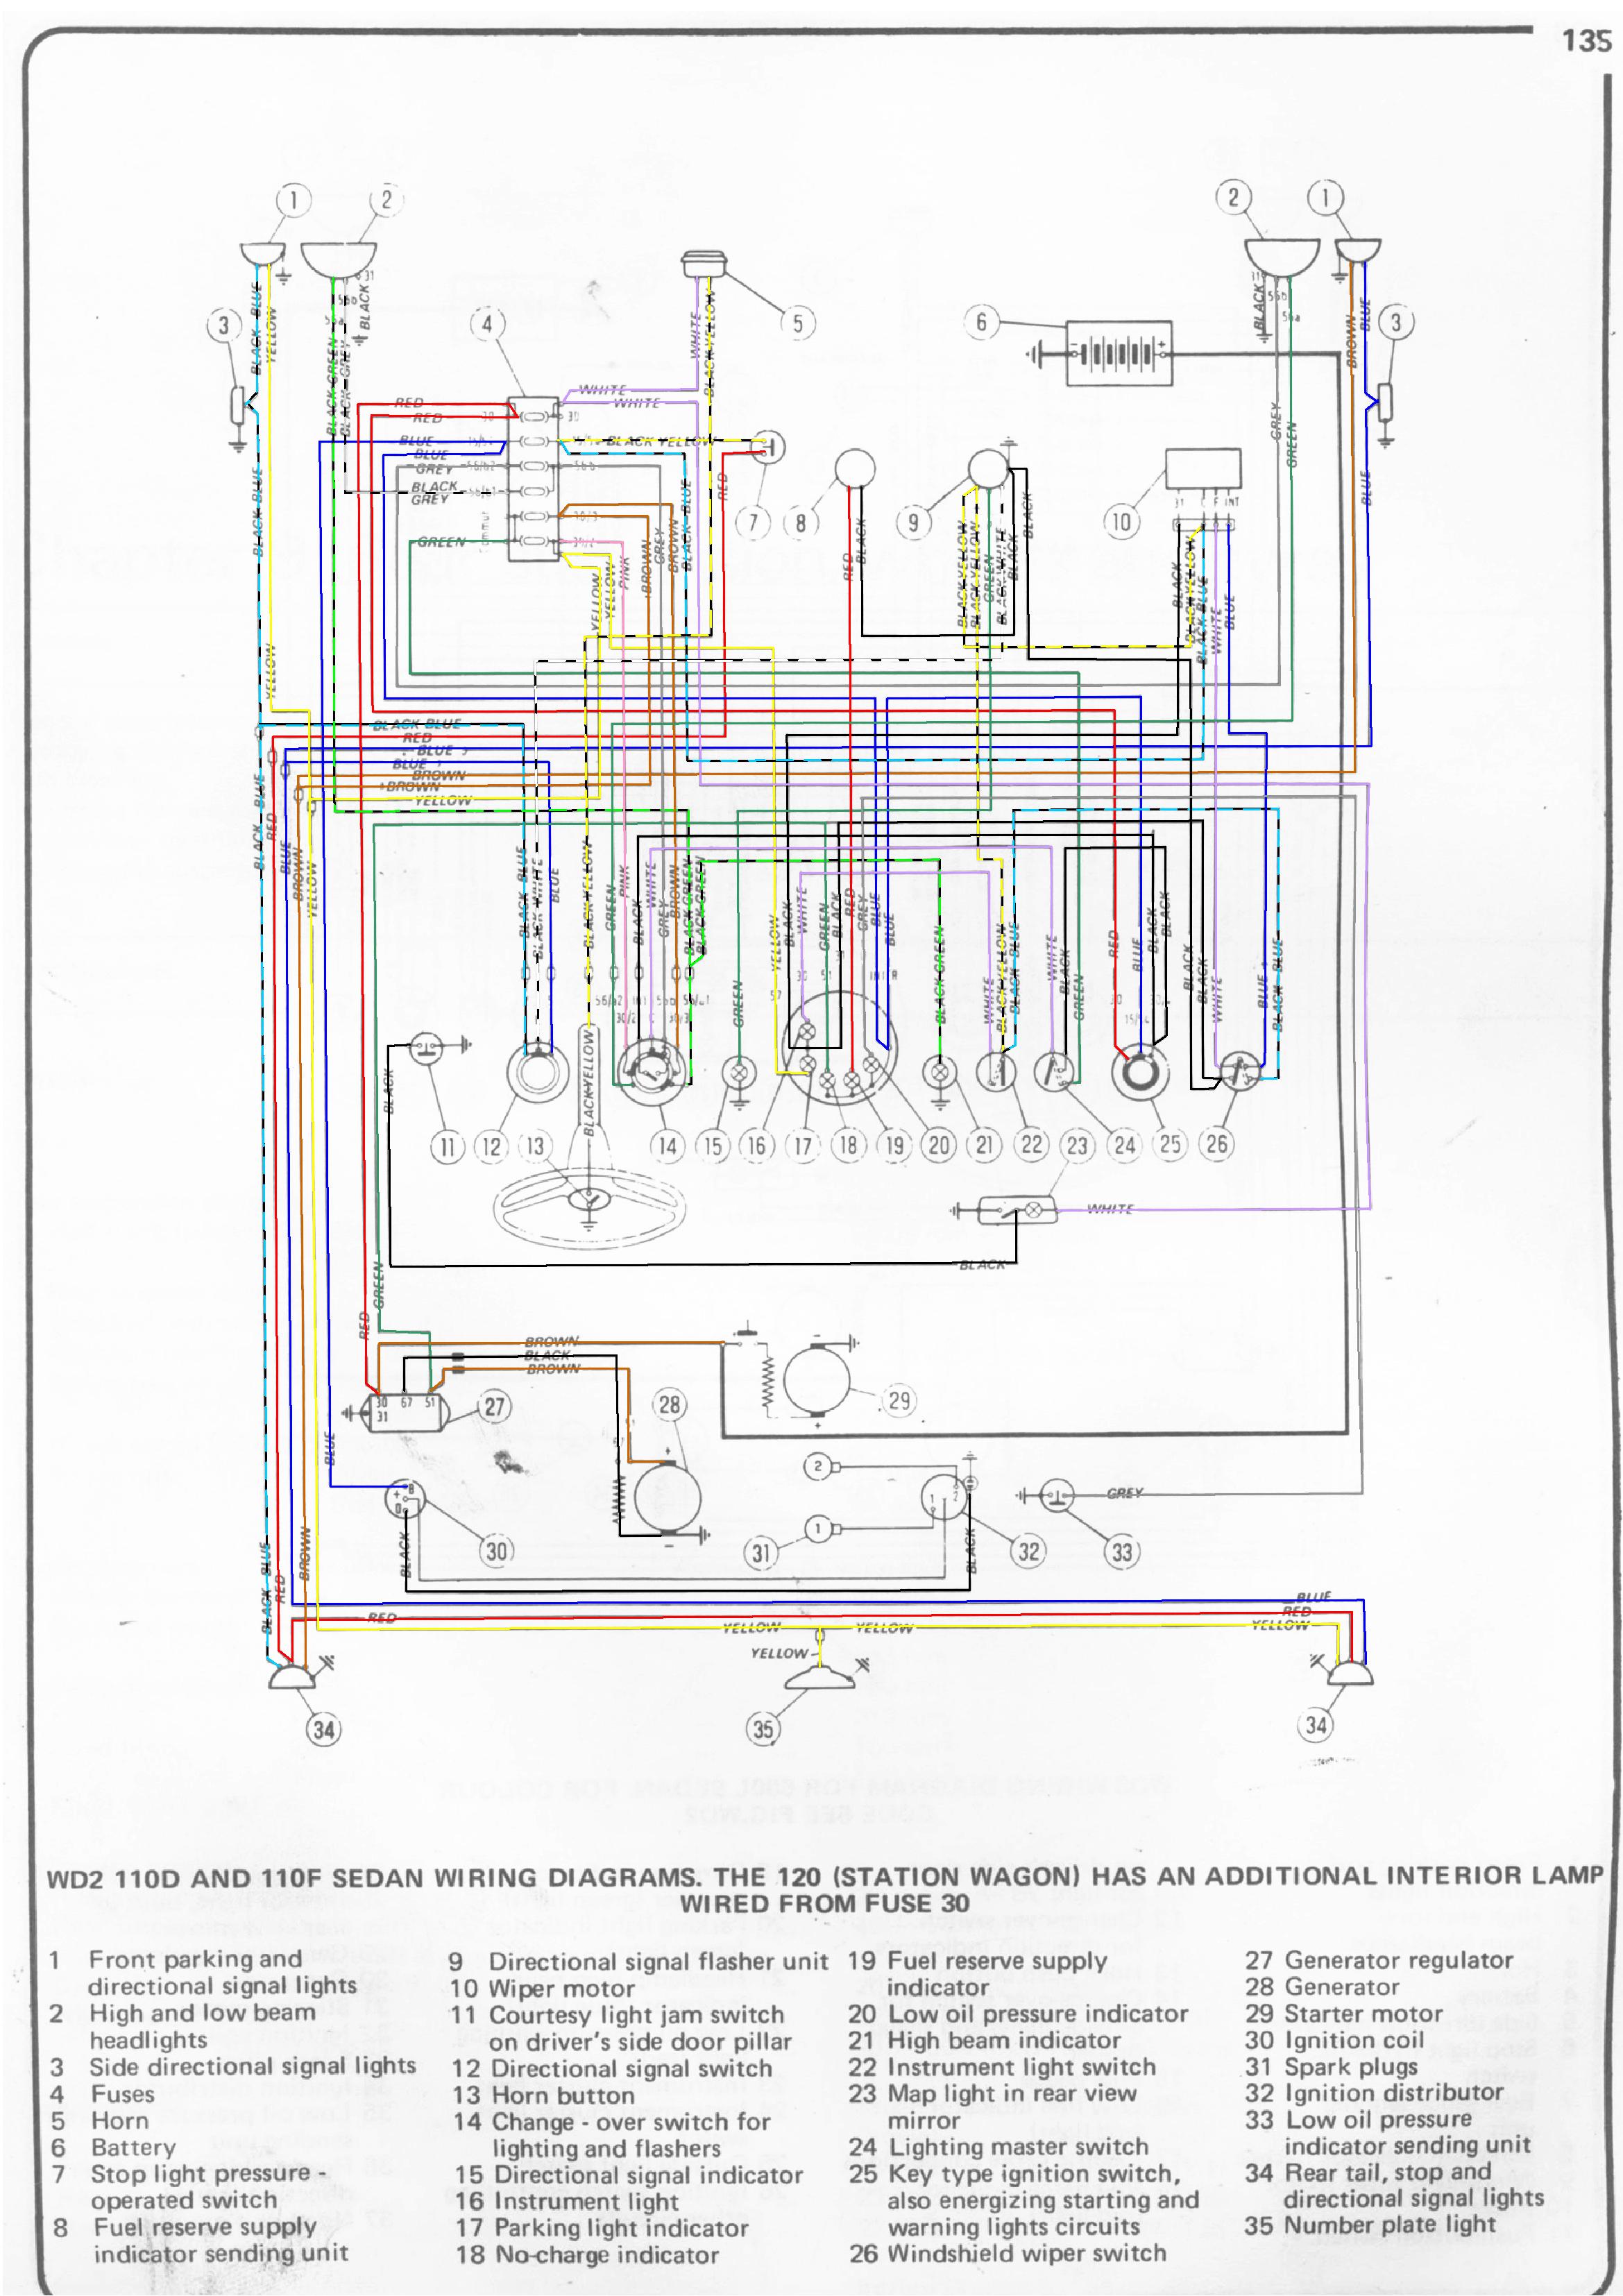 Fiat 600 Wiring Diagram Completed Diagrams Schematic Traffic Light Simple Schema Seicento Radio 1981 Spider